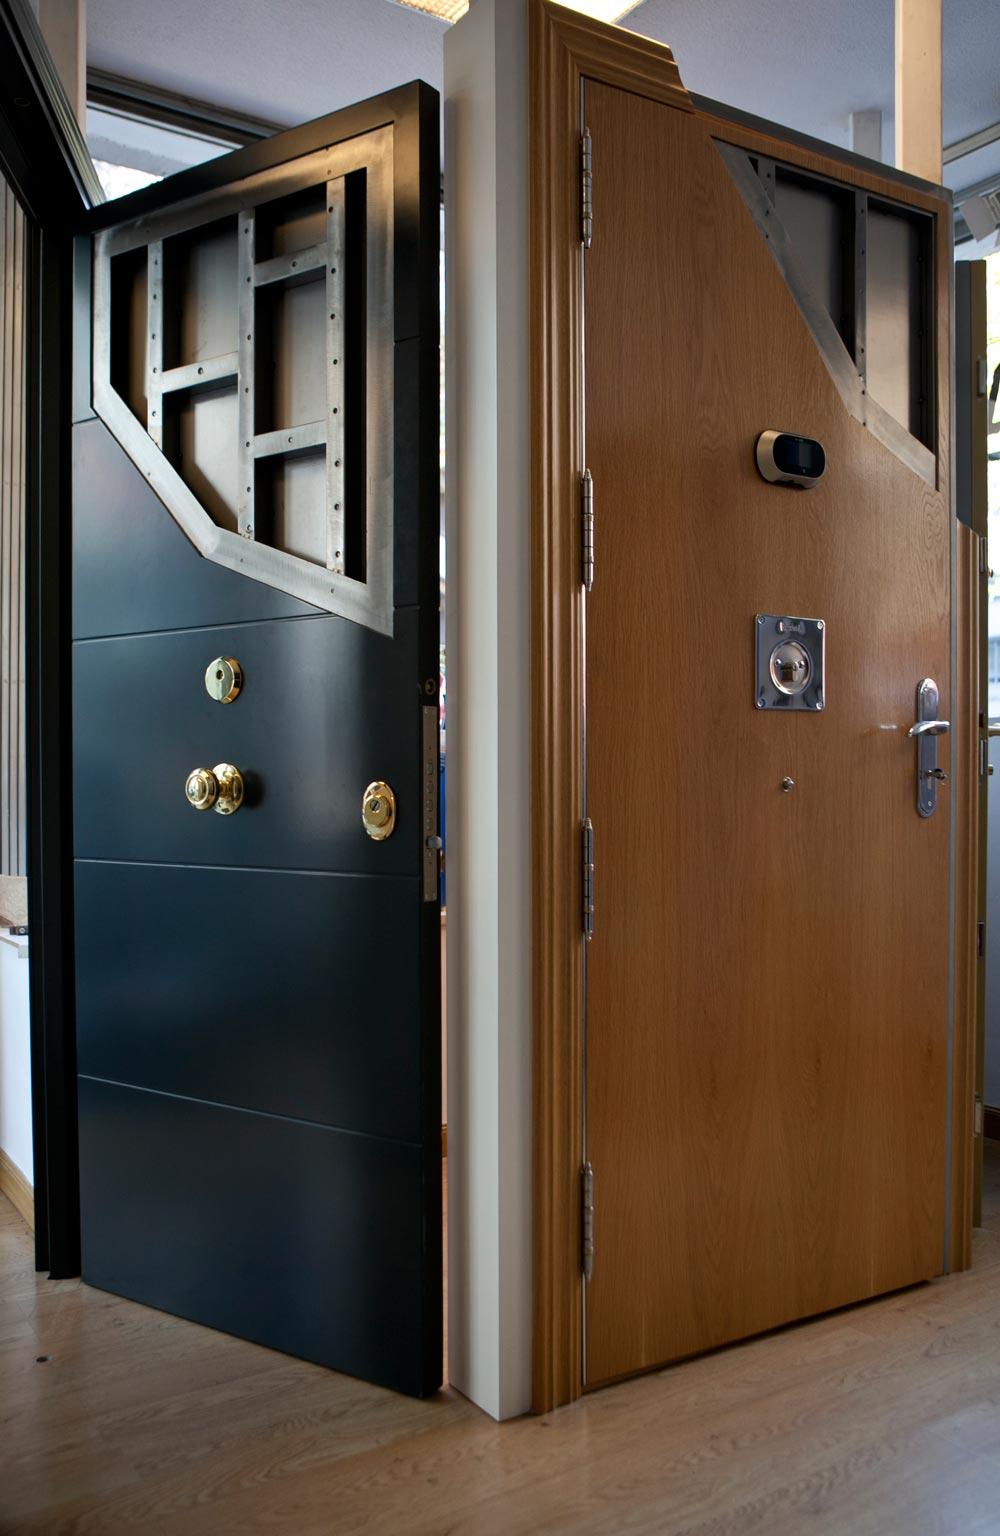 Fotos de puertas roconsa roconsa for Puerta blindada casa